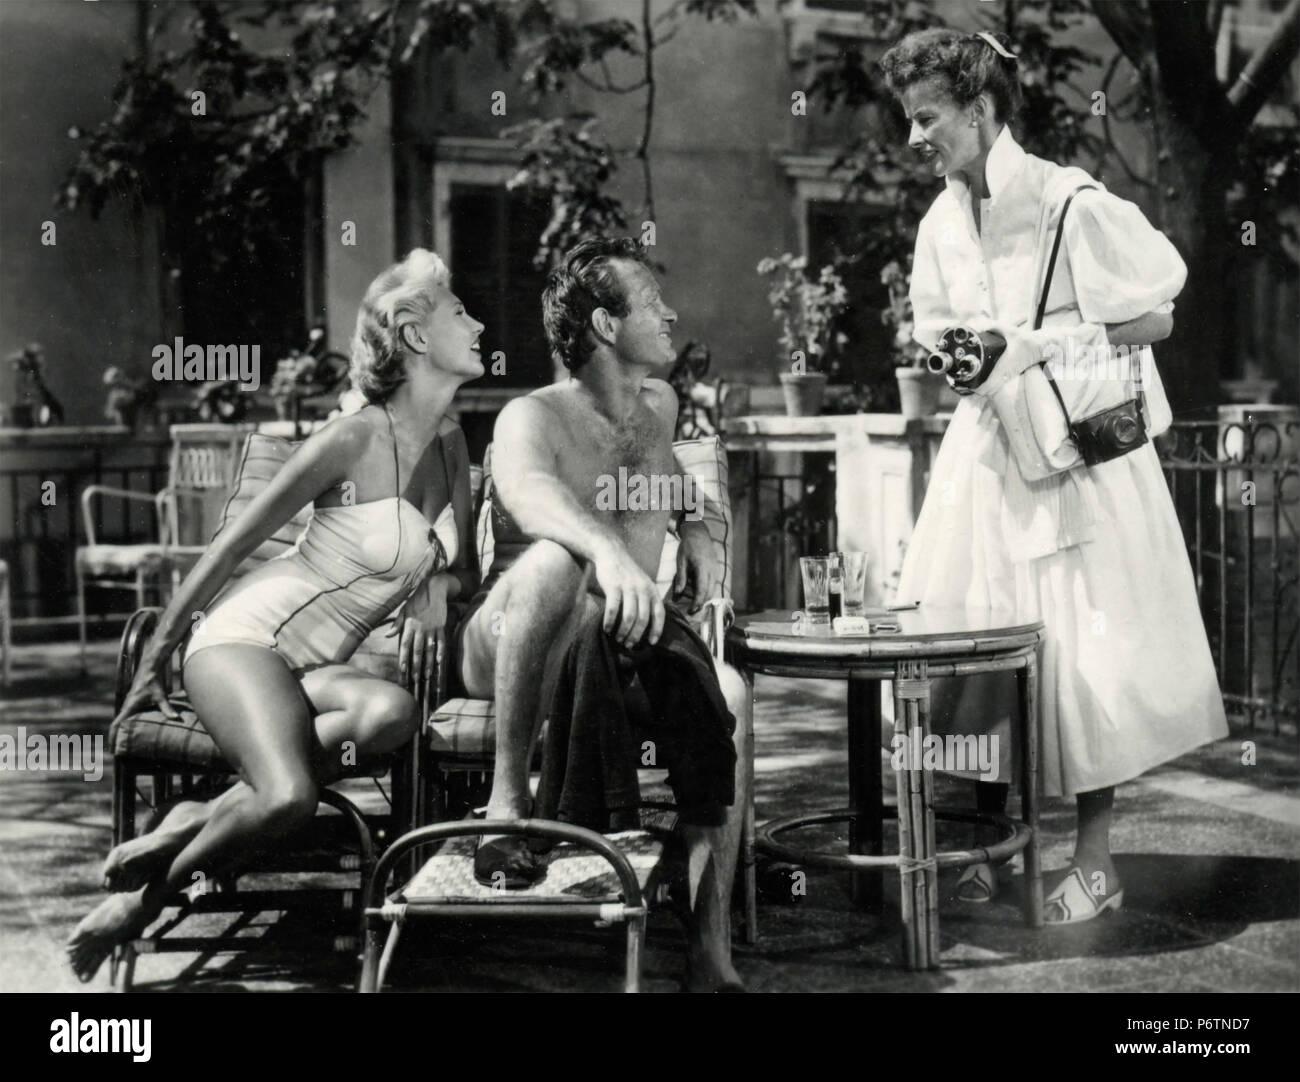 Acteurs Katherine Hepburn, Mari Aldon, et Darren McGavin dans le film Summertime, USA 1955 Photo Stock